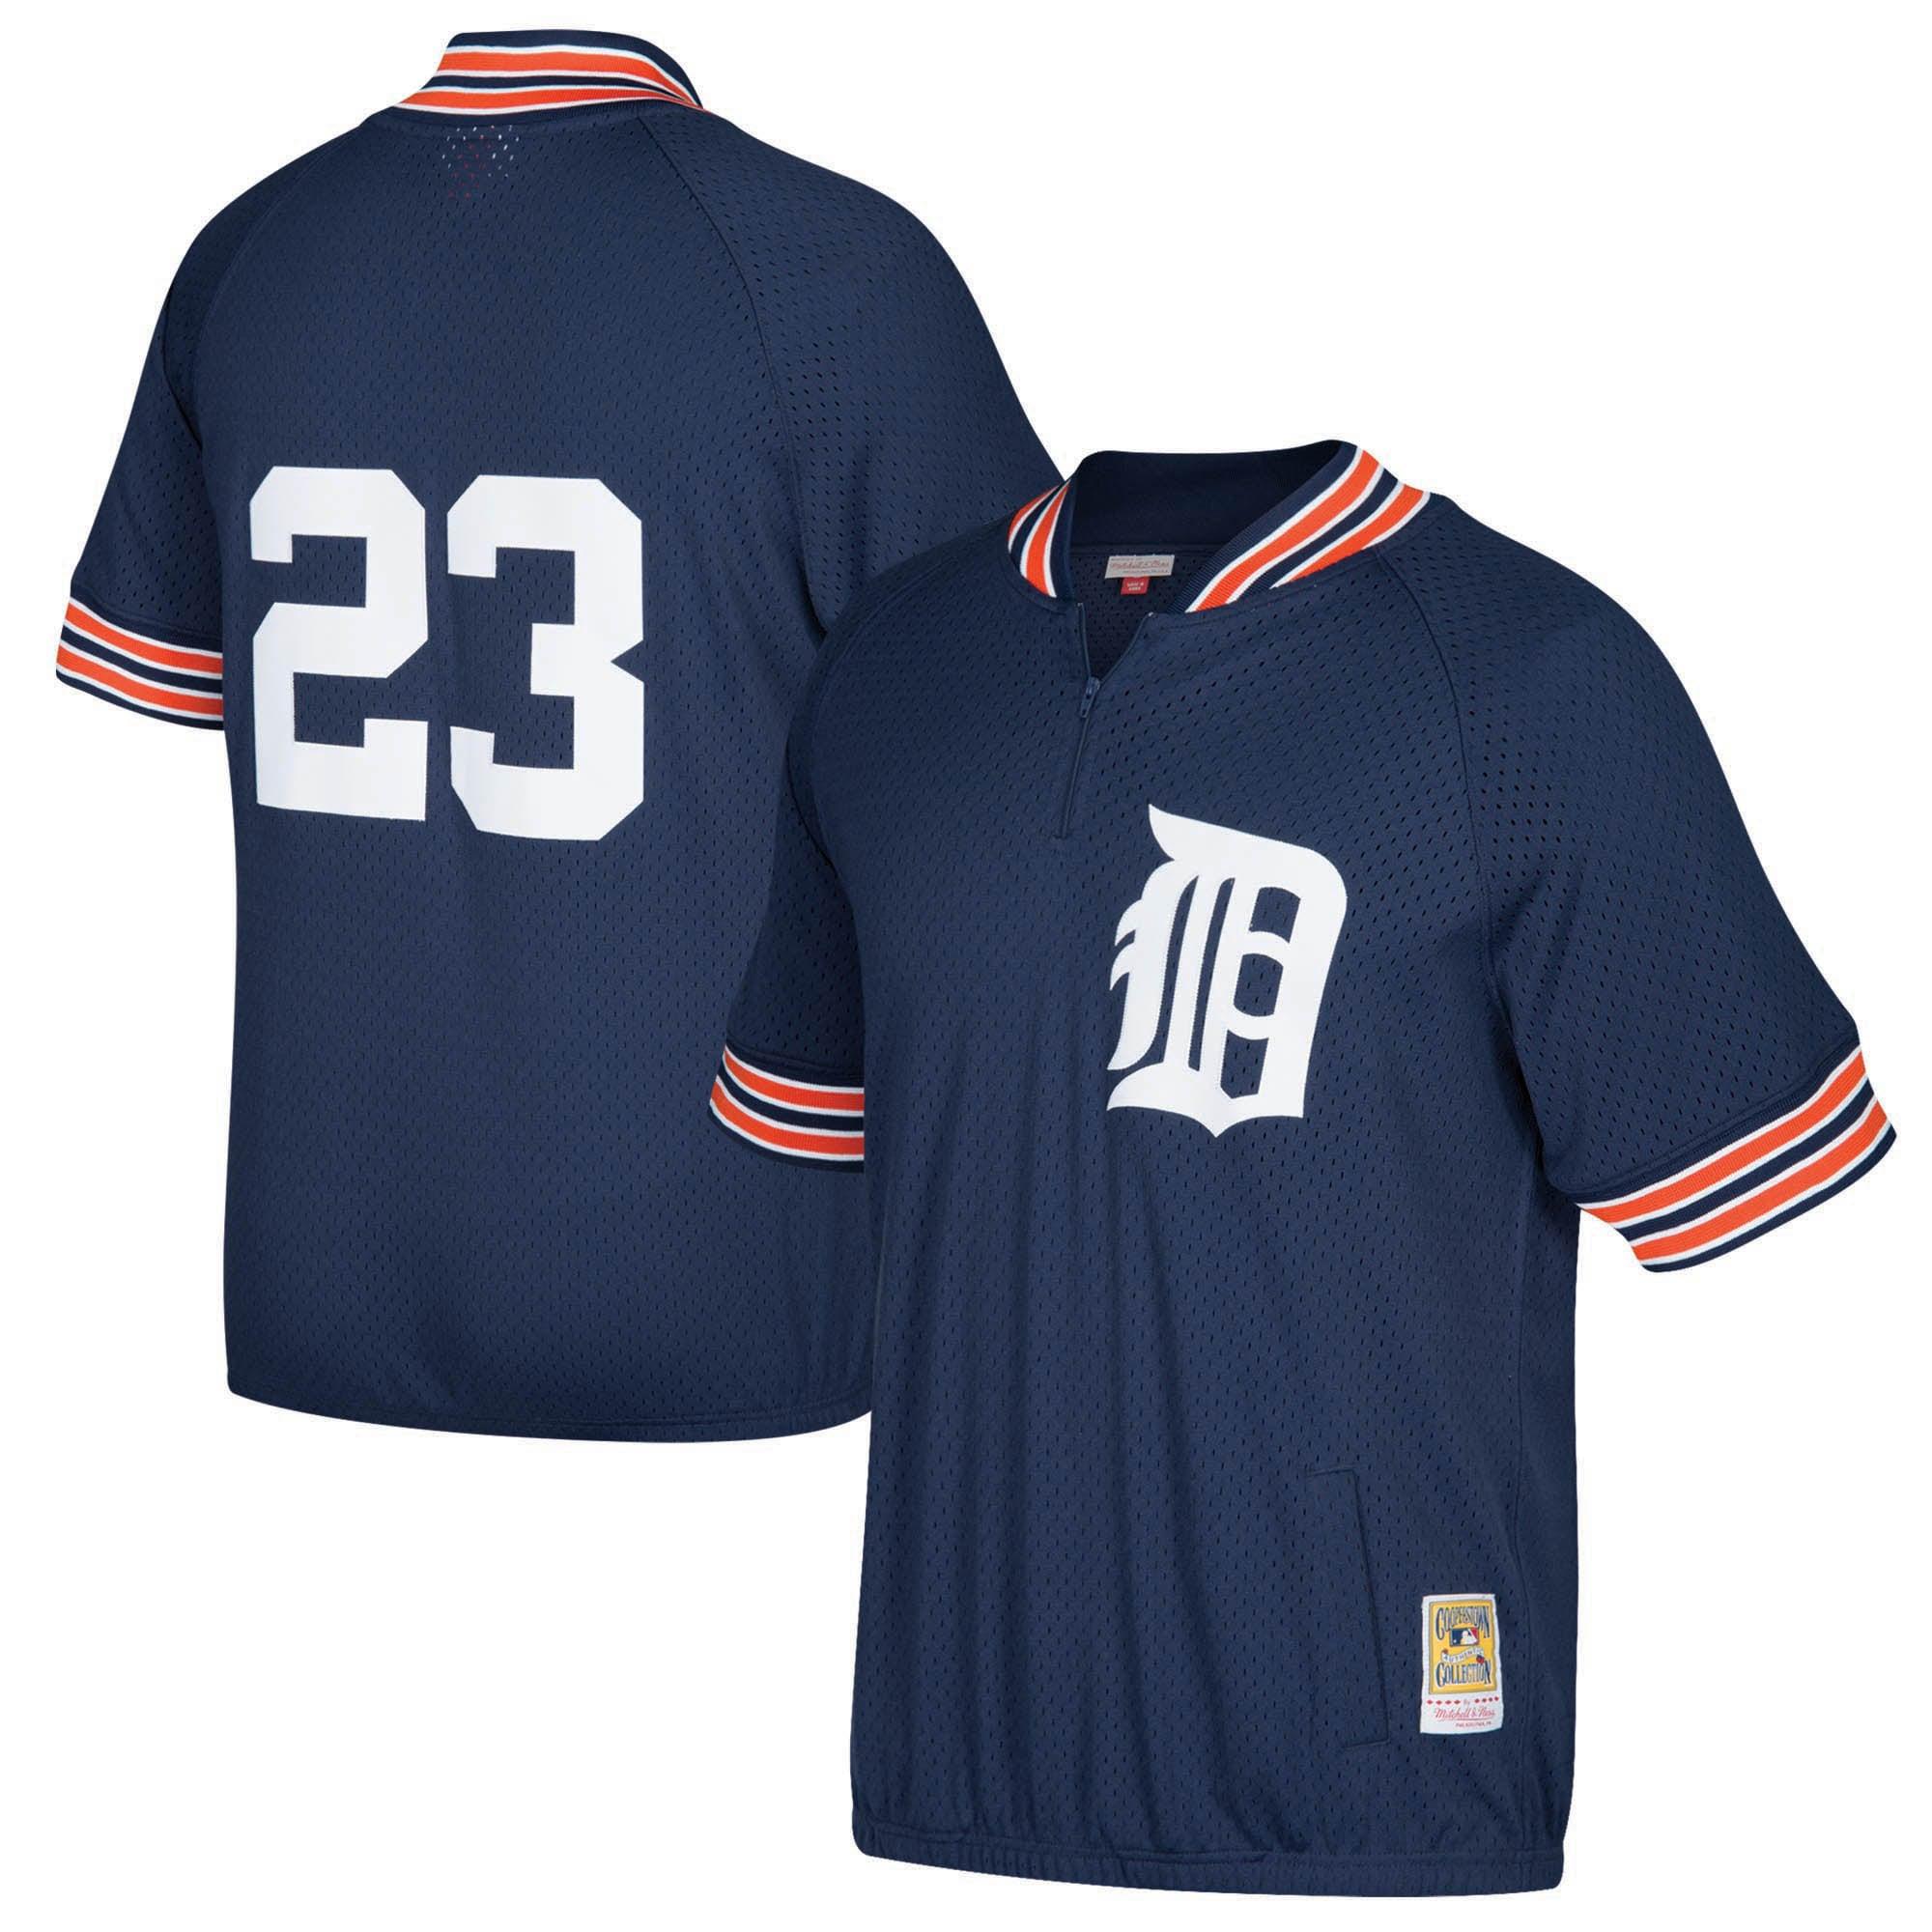 Kirk Gibson Detroit Tigers Mitchell & Ness Cooperstown Collection Mesh Batting Practice Quarter-Zip Jersey - Navy